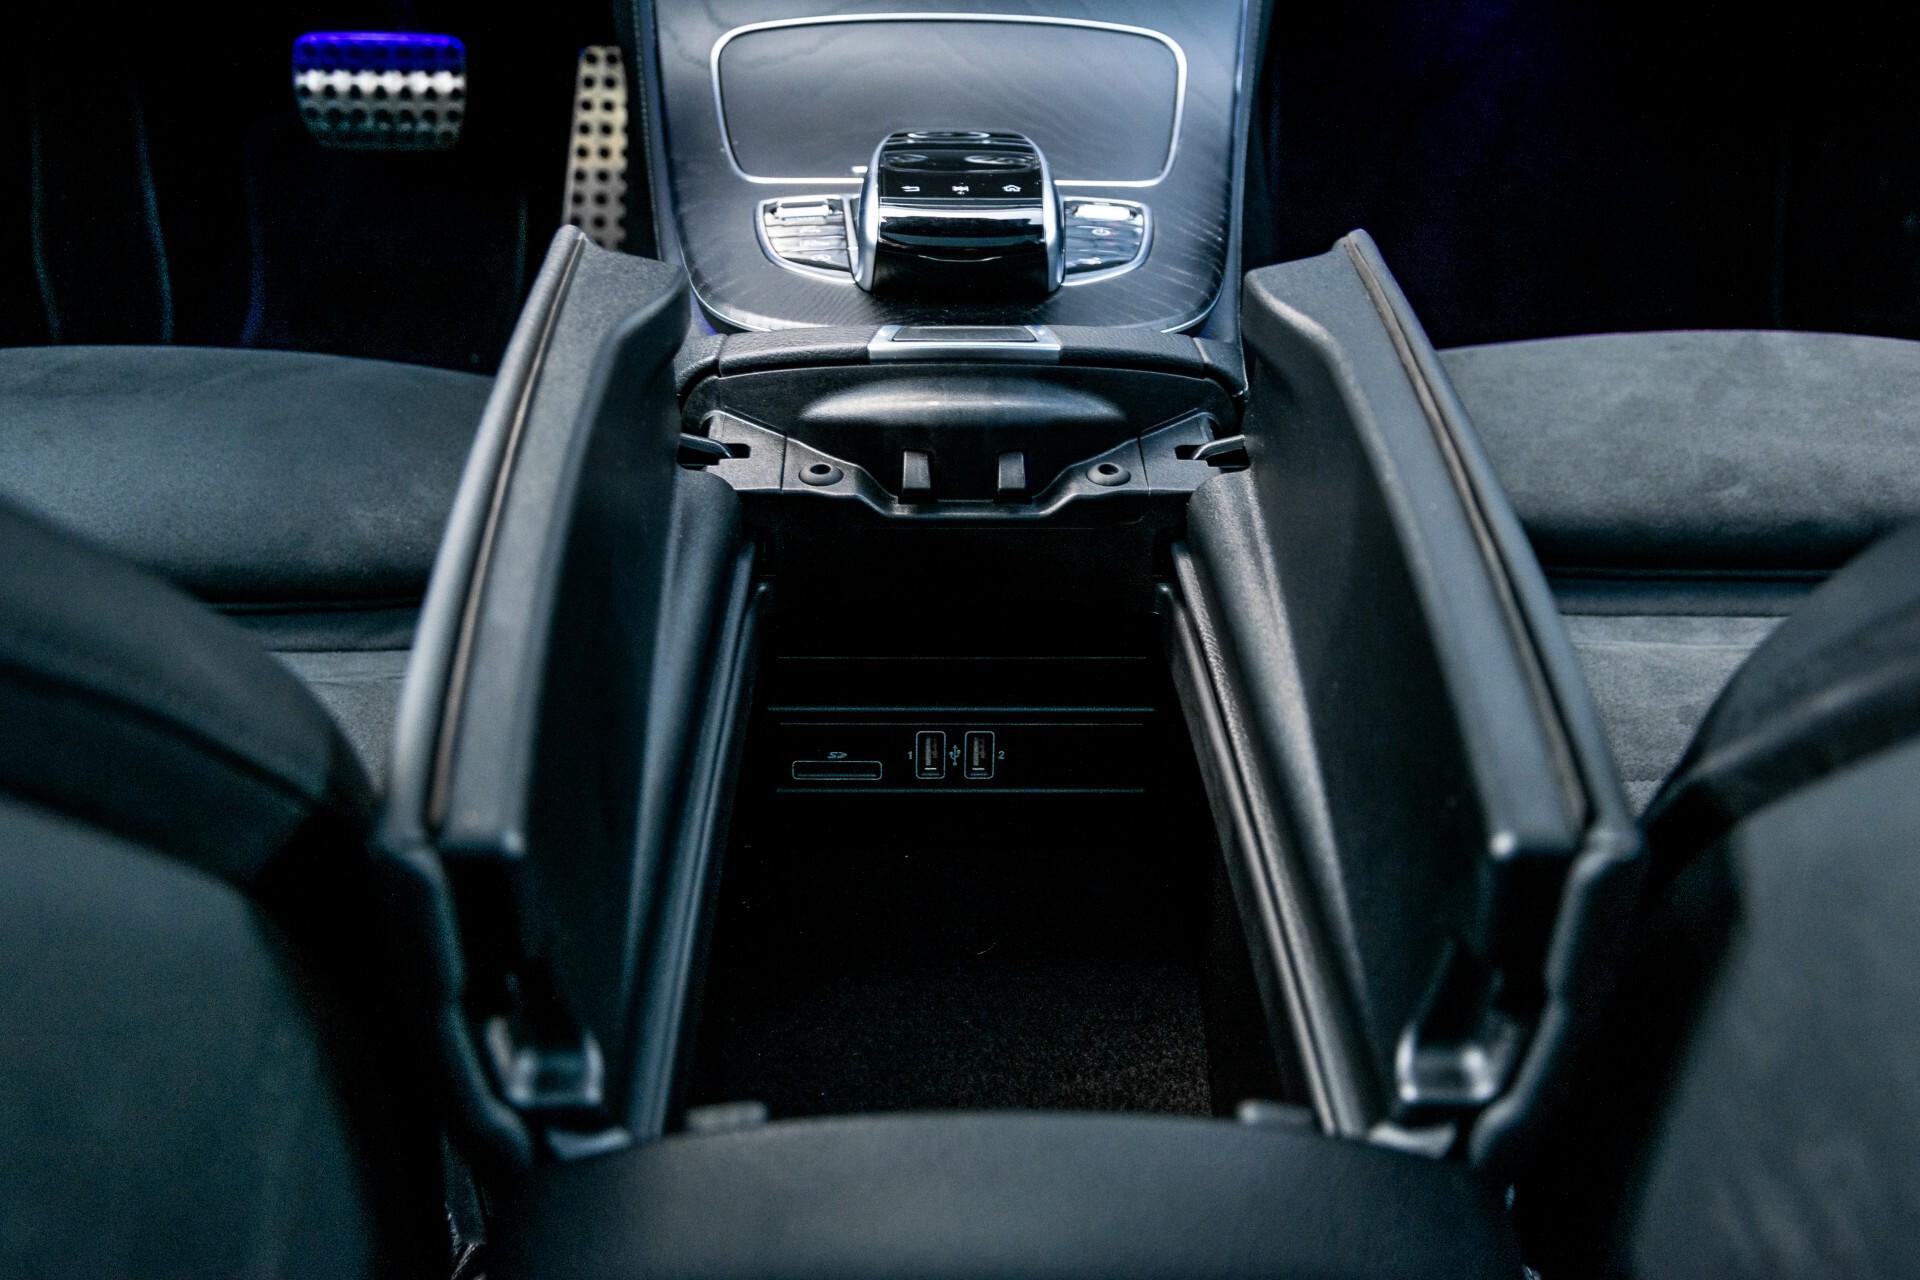 Mercedes-Benz E-Klasse Coupé 300 AMG Panorama/Rij-assist/Keyless/Massage/Memory/HUD/Standkachel/Night Aut9 Foto 52